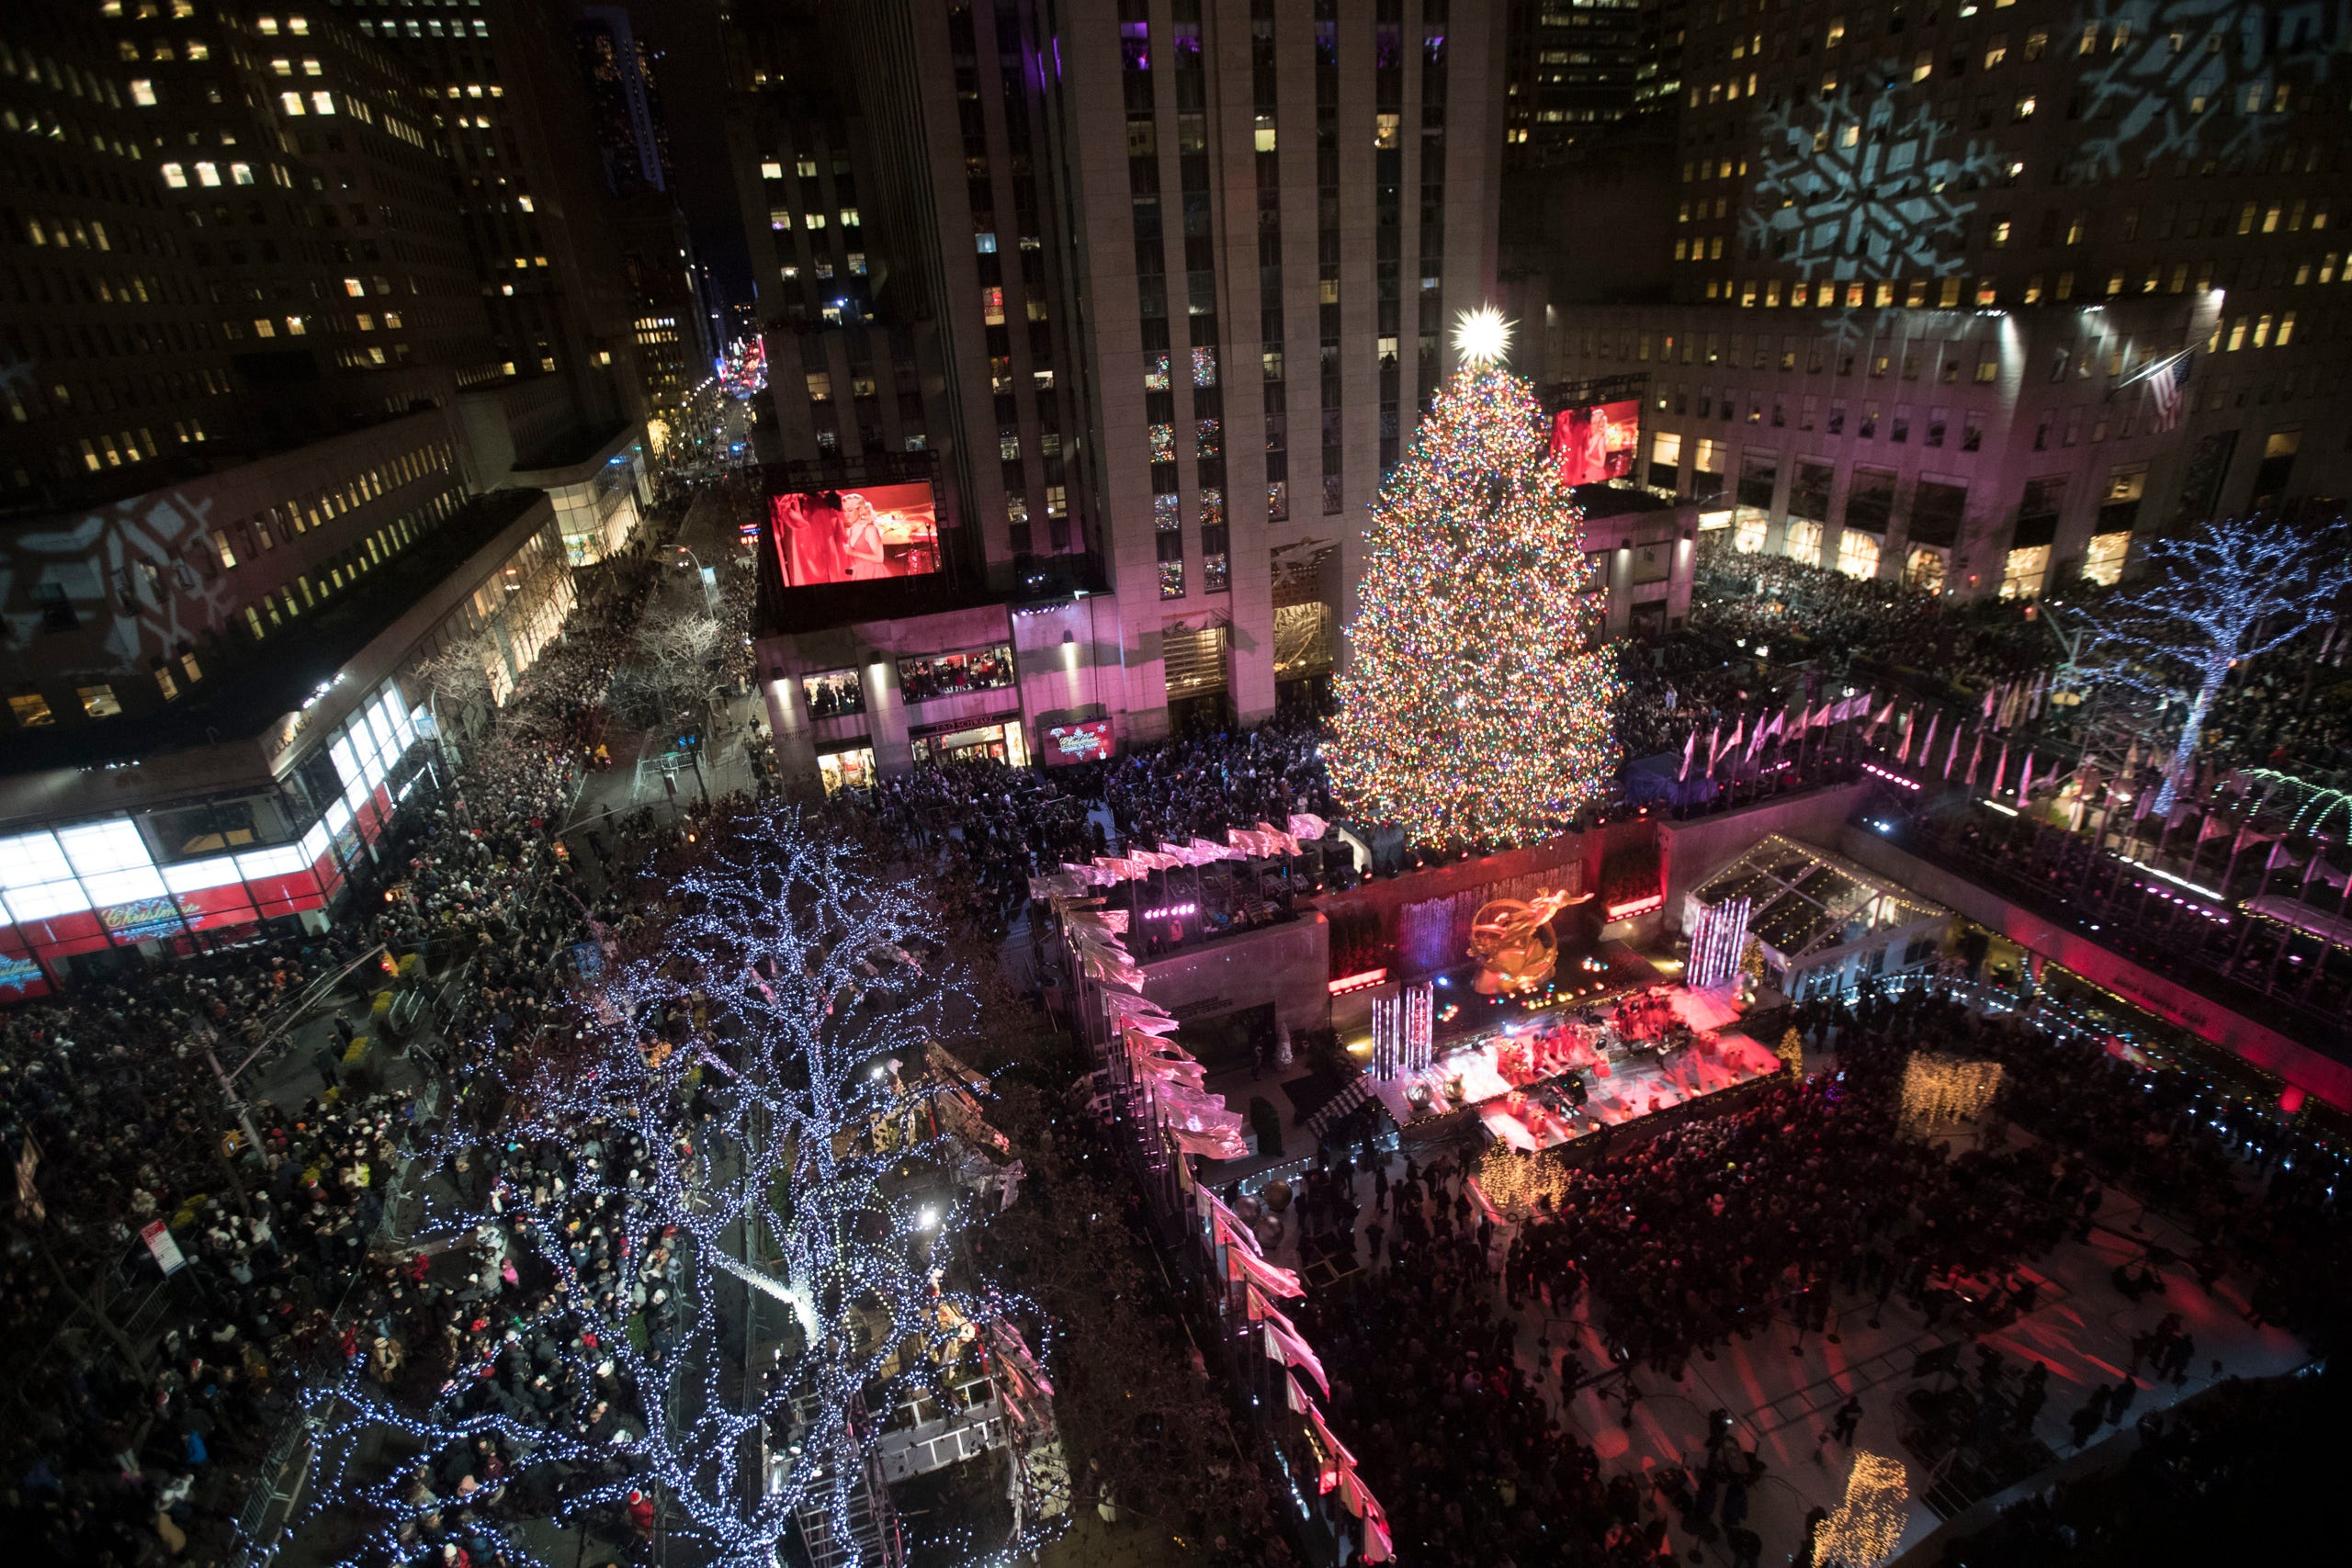 Lighting Of Rockefeller Christmas Tree.Lighting Of The Rockefeller Center Christmas Tree Kicks Off